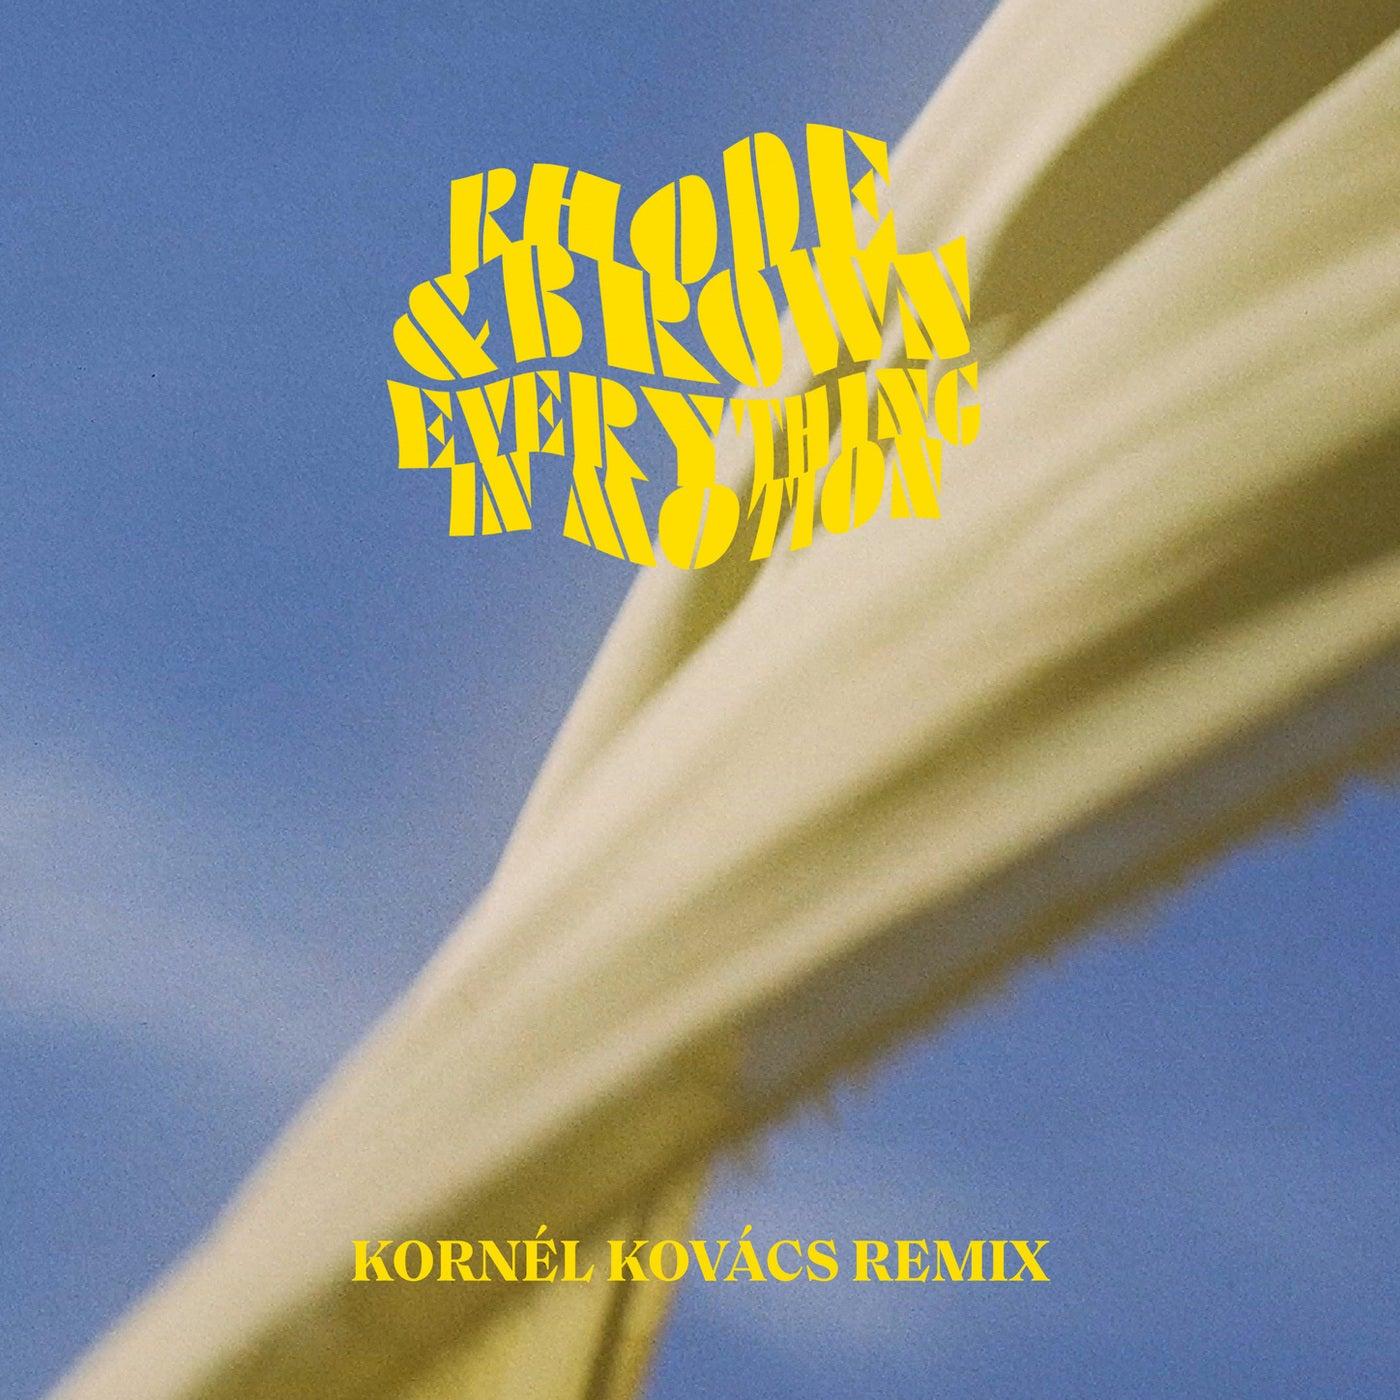 Everything in Motion feat. Indra Dunis (Kornél Kovács Remix)